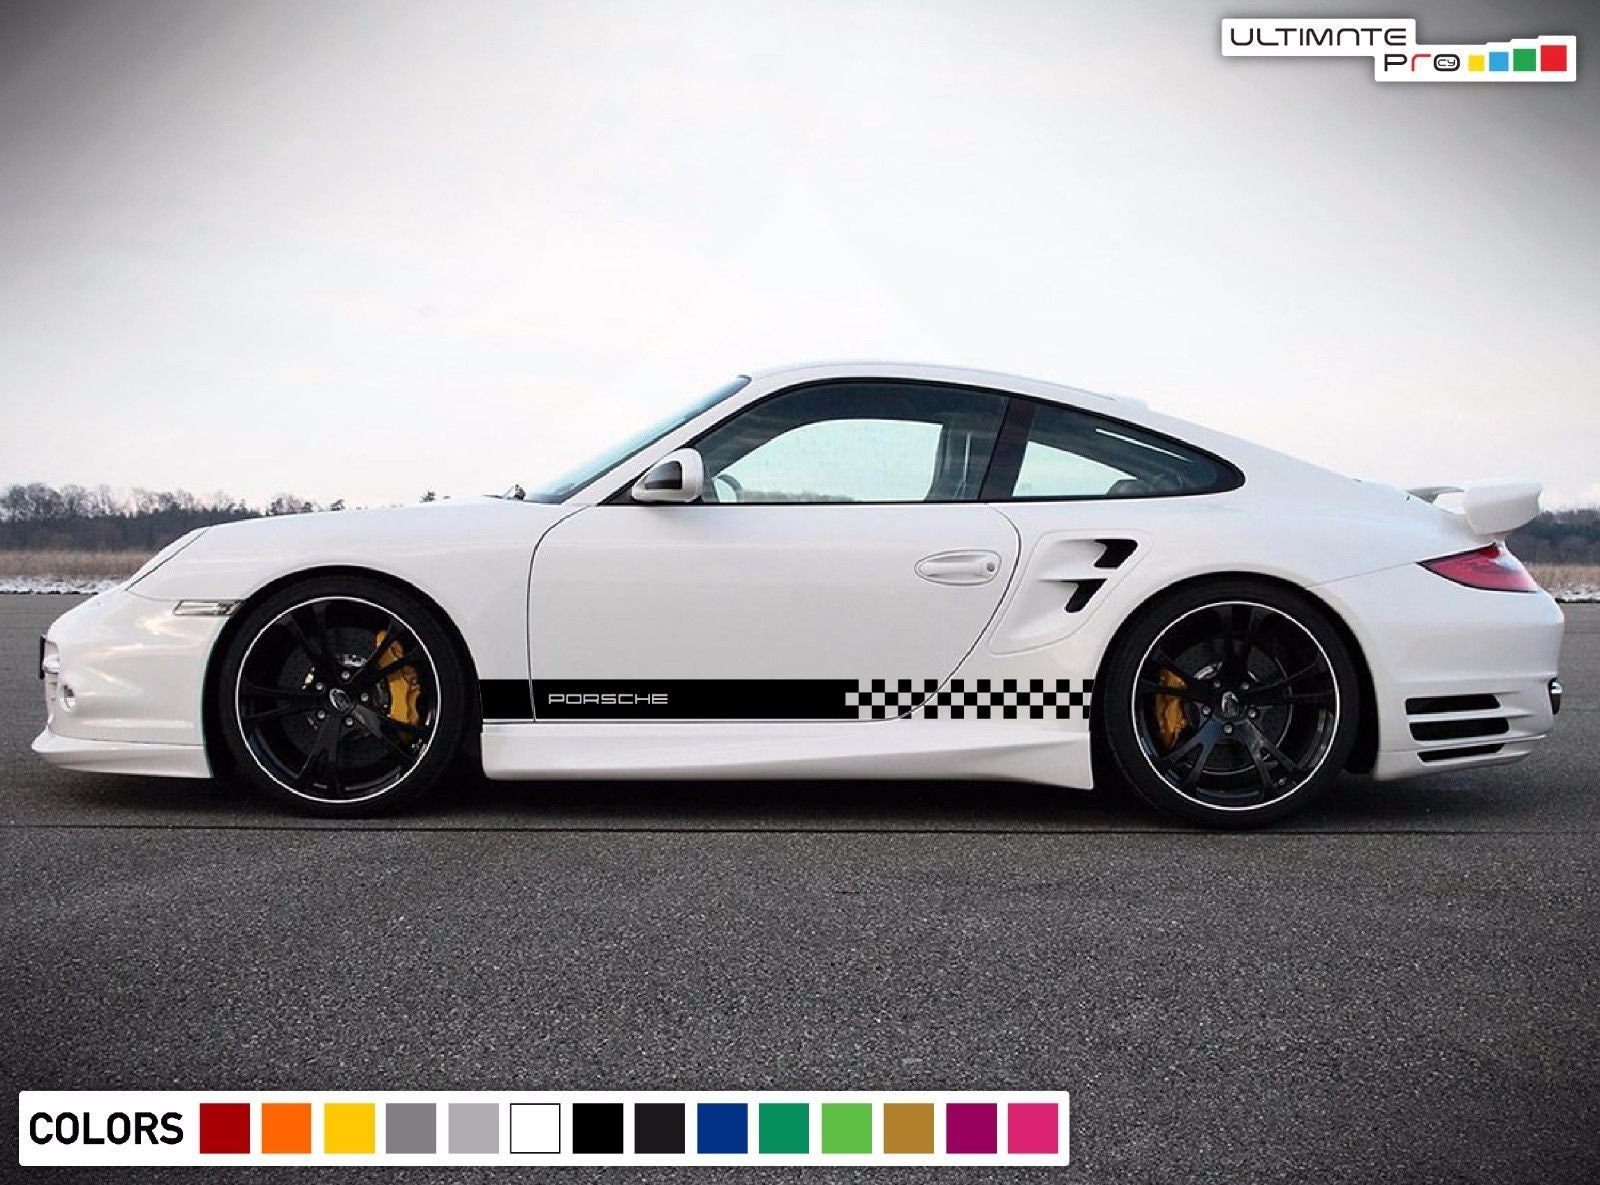 Sticker Decal Vinyl Side Door Stripes For Porsche 911 997